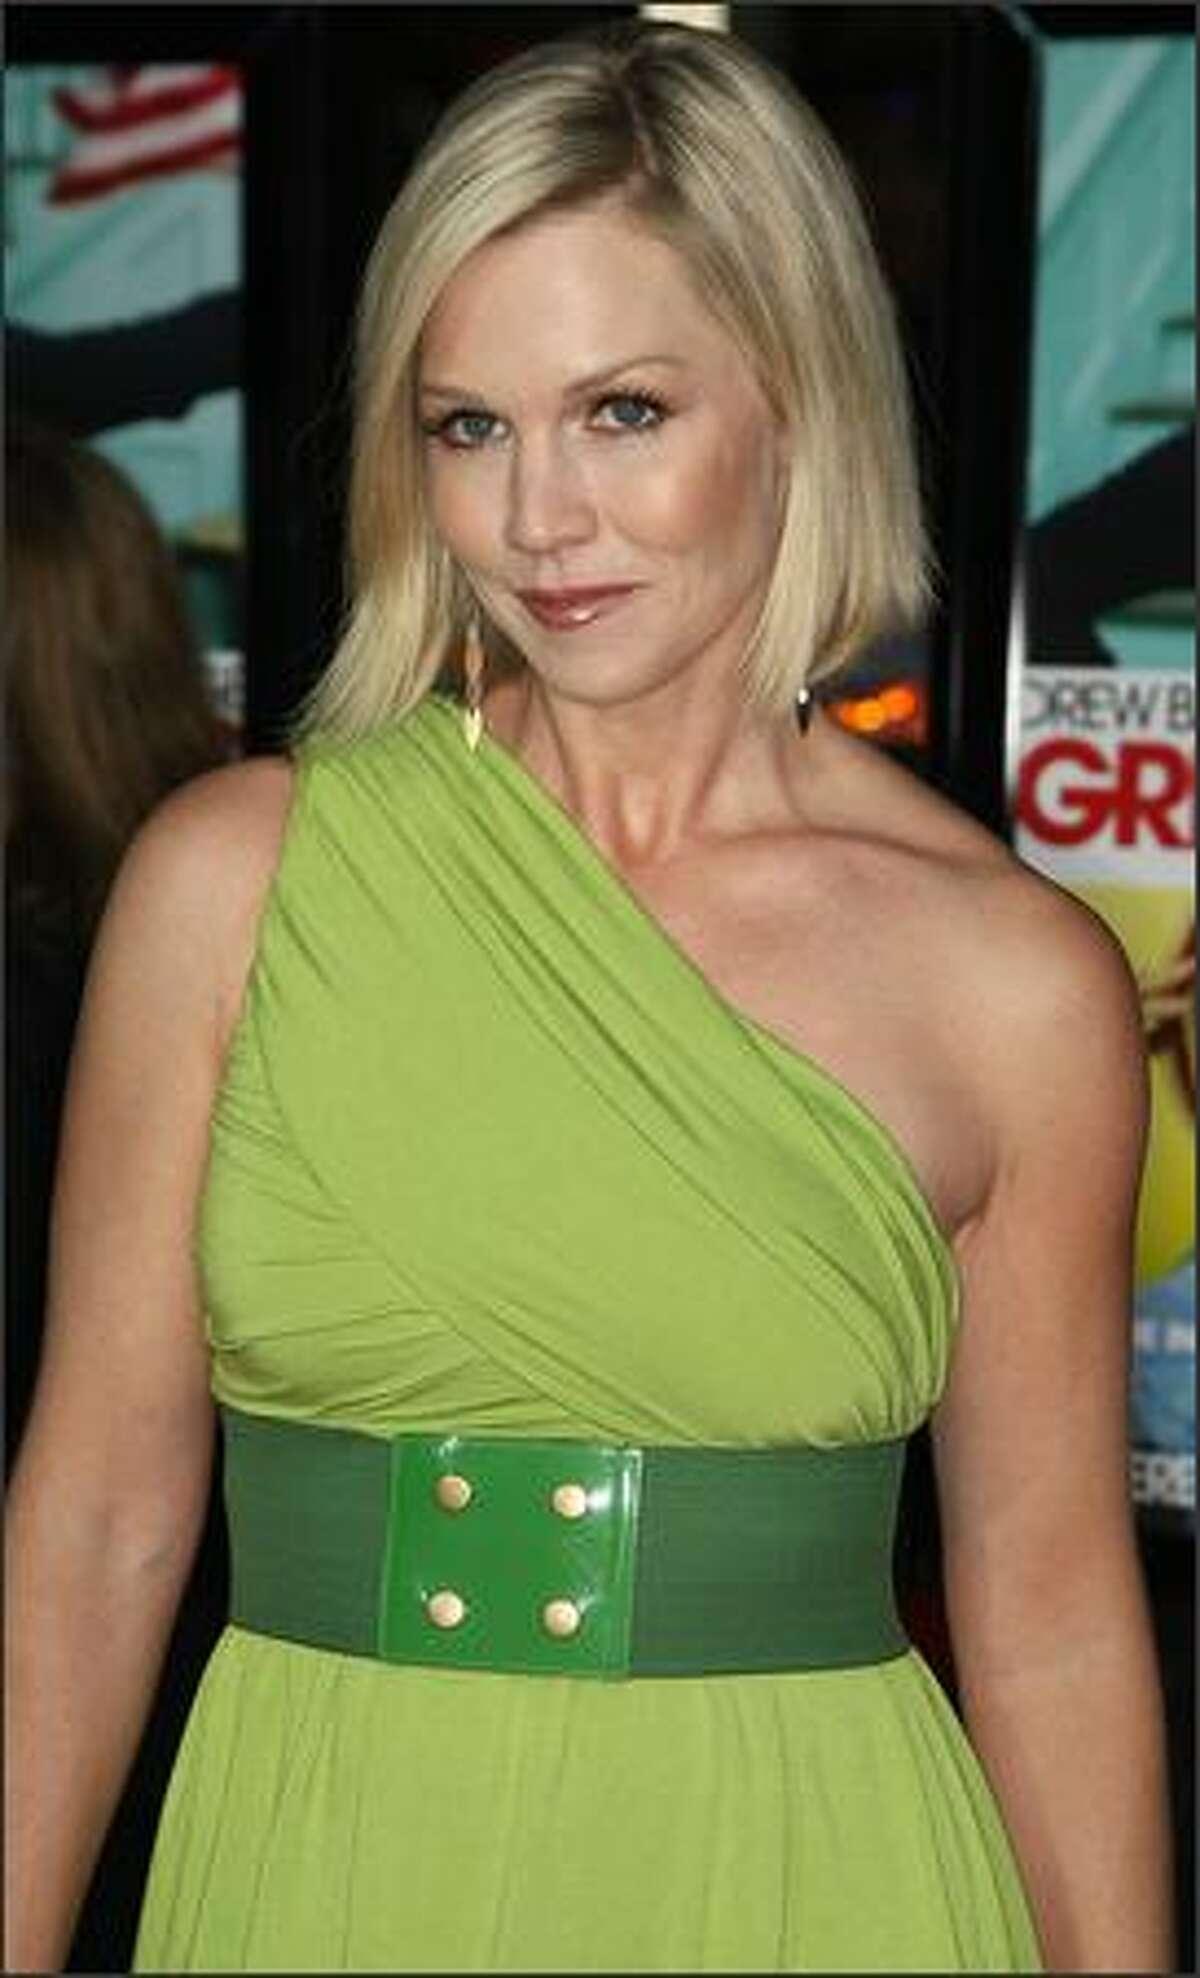 Actress Jennie Garth attends the